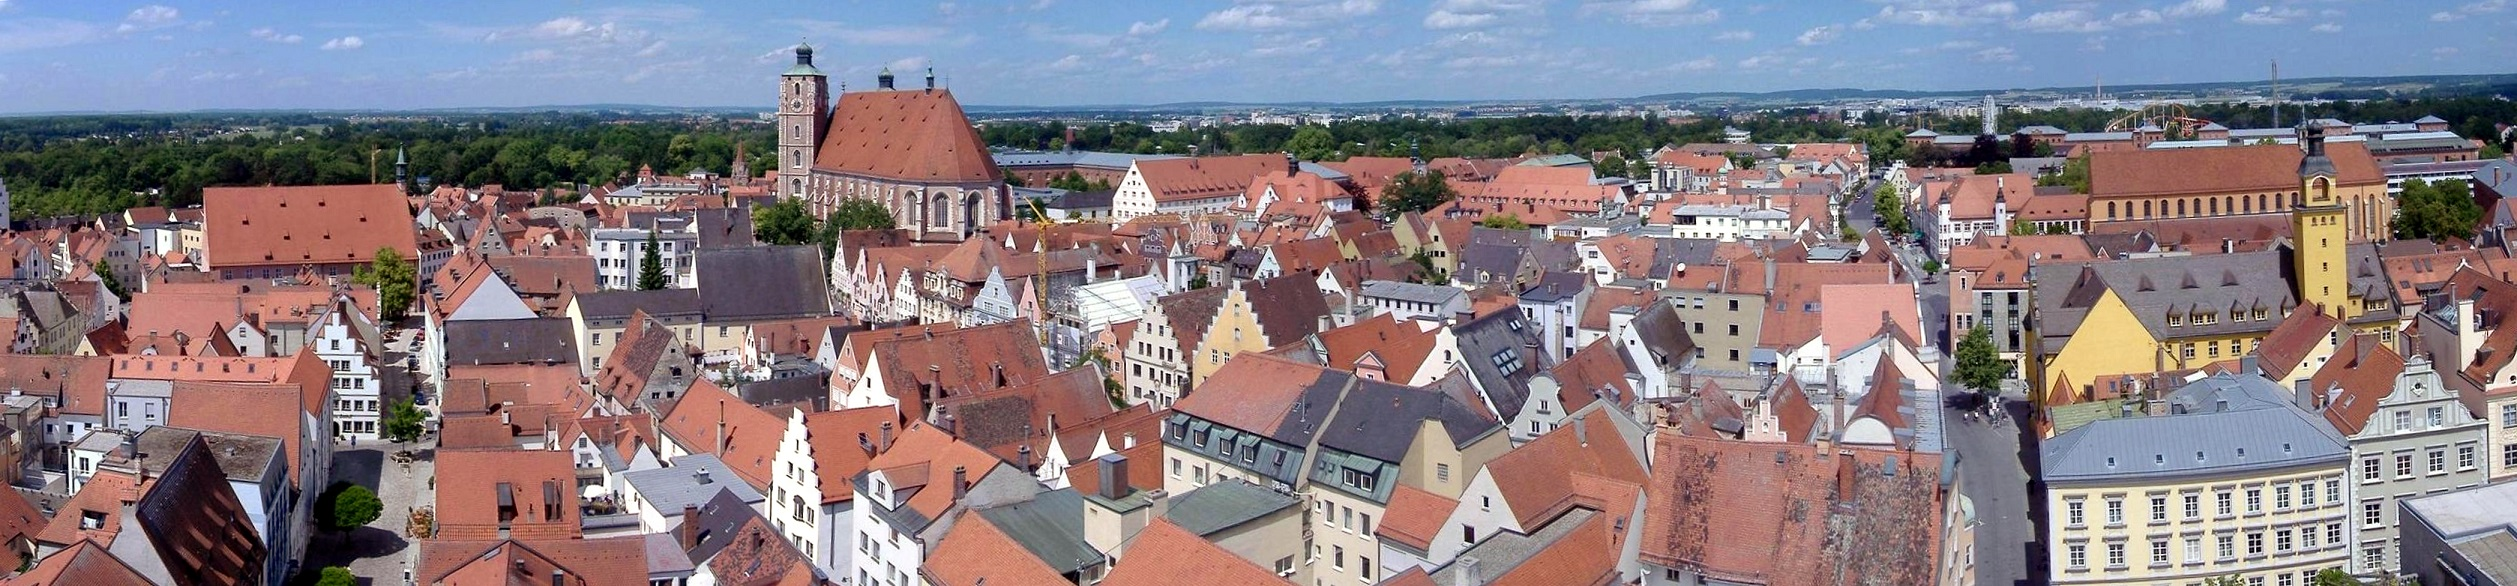 Panorama Ingolstadt